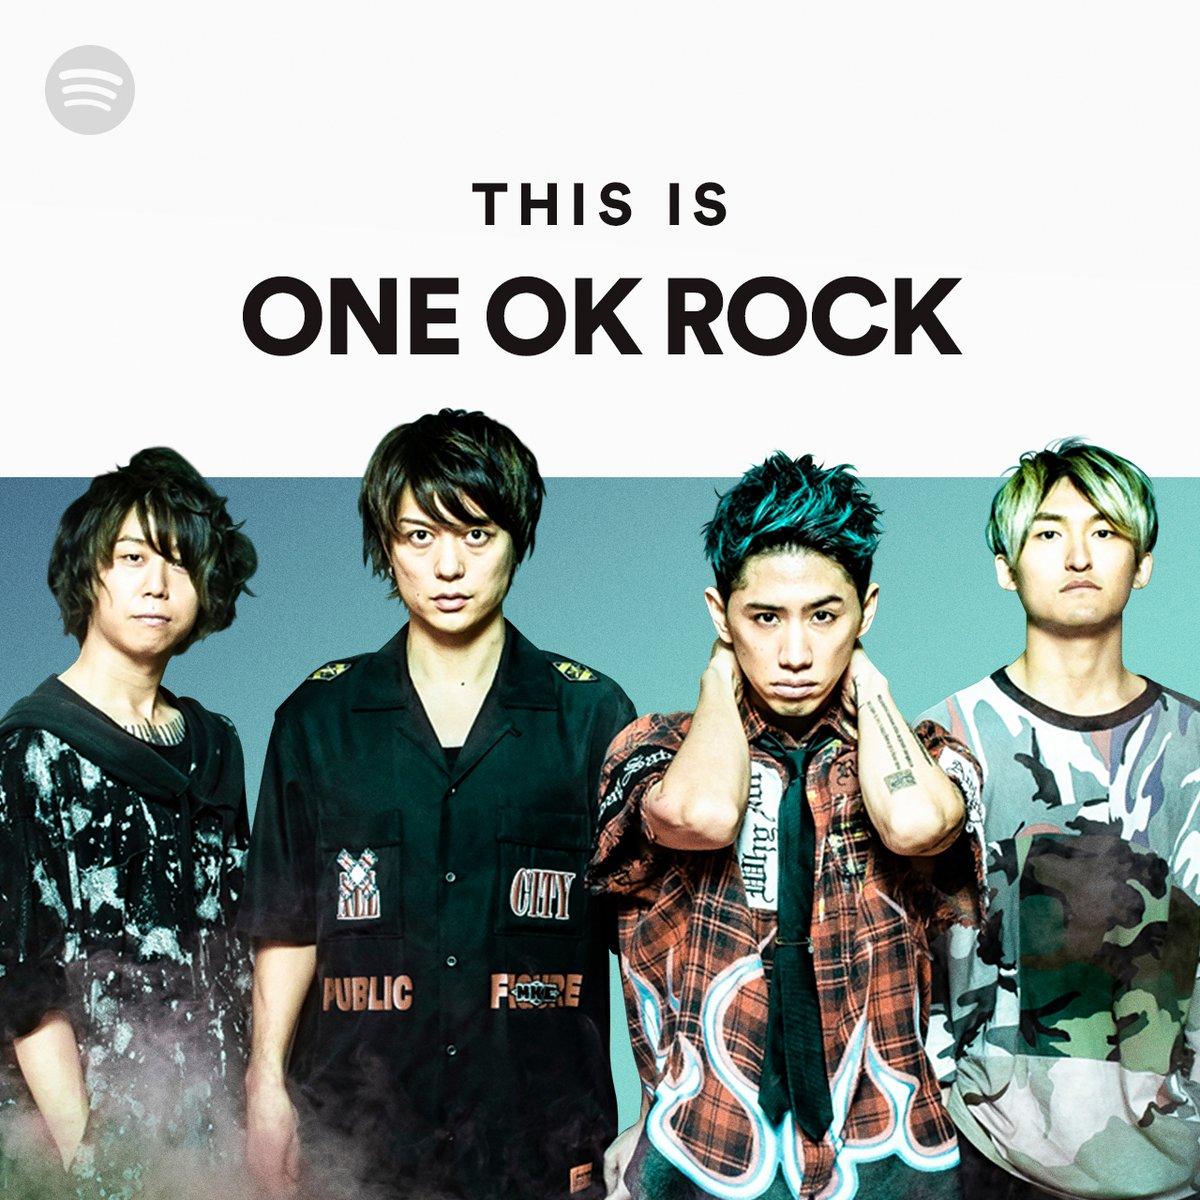 / ㊗ONE OK ROCK Spotifyで 7億回再生 & マンスリーリスナー数が 200万人を突破🎉🎉 \ Spotifyでさらに @ONEOKROCK_japan の世界へ⚡️ This Is ONE OK ROCK 👉spoti.fi/ThisIsOOR 彼らがセレクトしたプレイリスト Listening Together #聴いてつながろう 👉 spoti.fi/ListeningToget…